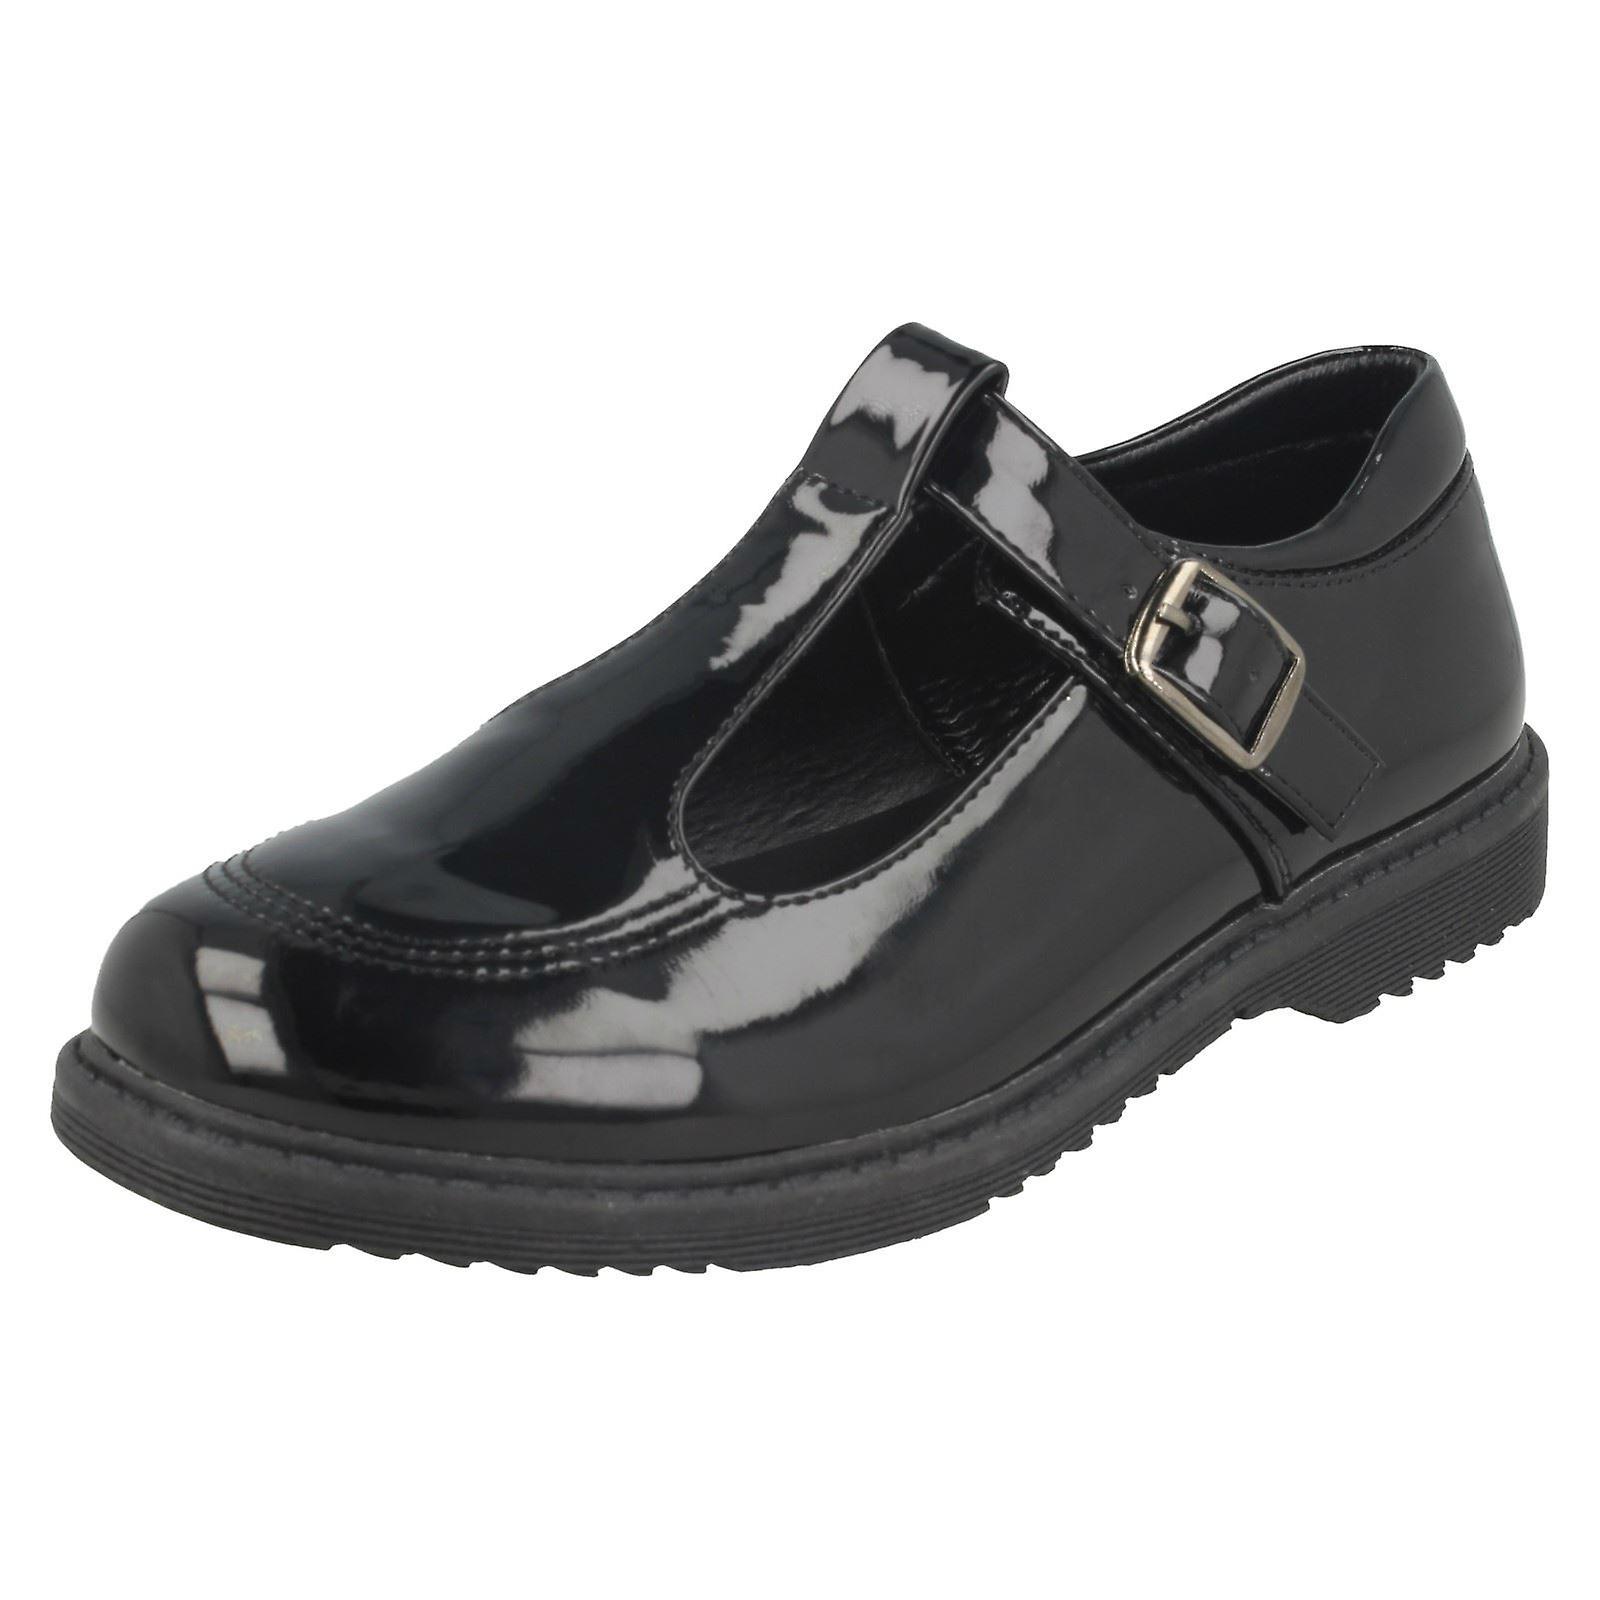 Girls Cool For School T-Bar temperament/Man's/Woman's Buckle School Shoes H2433/British temperament/Man's/Woman's T-Bar 6bf7ee